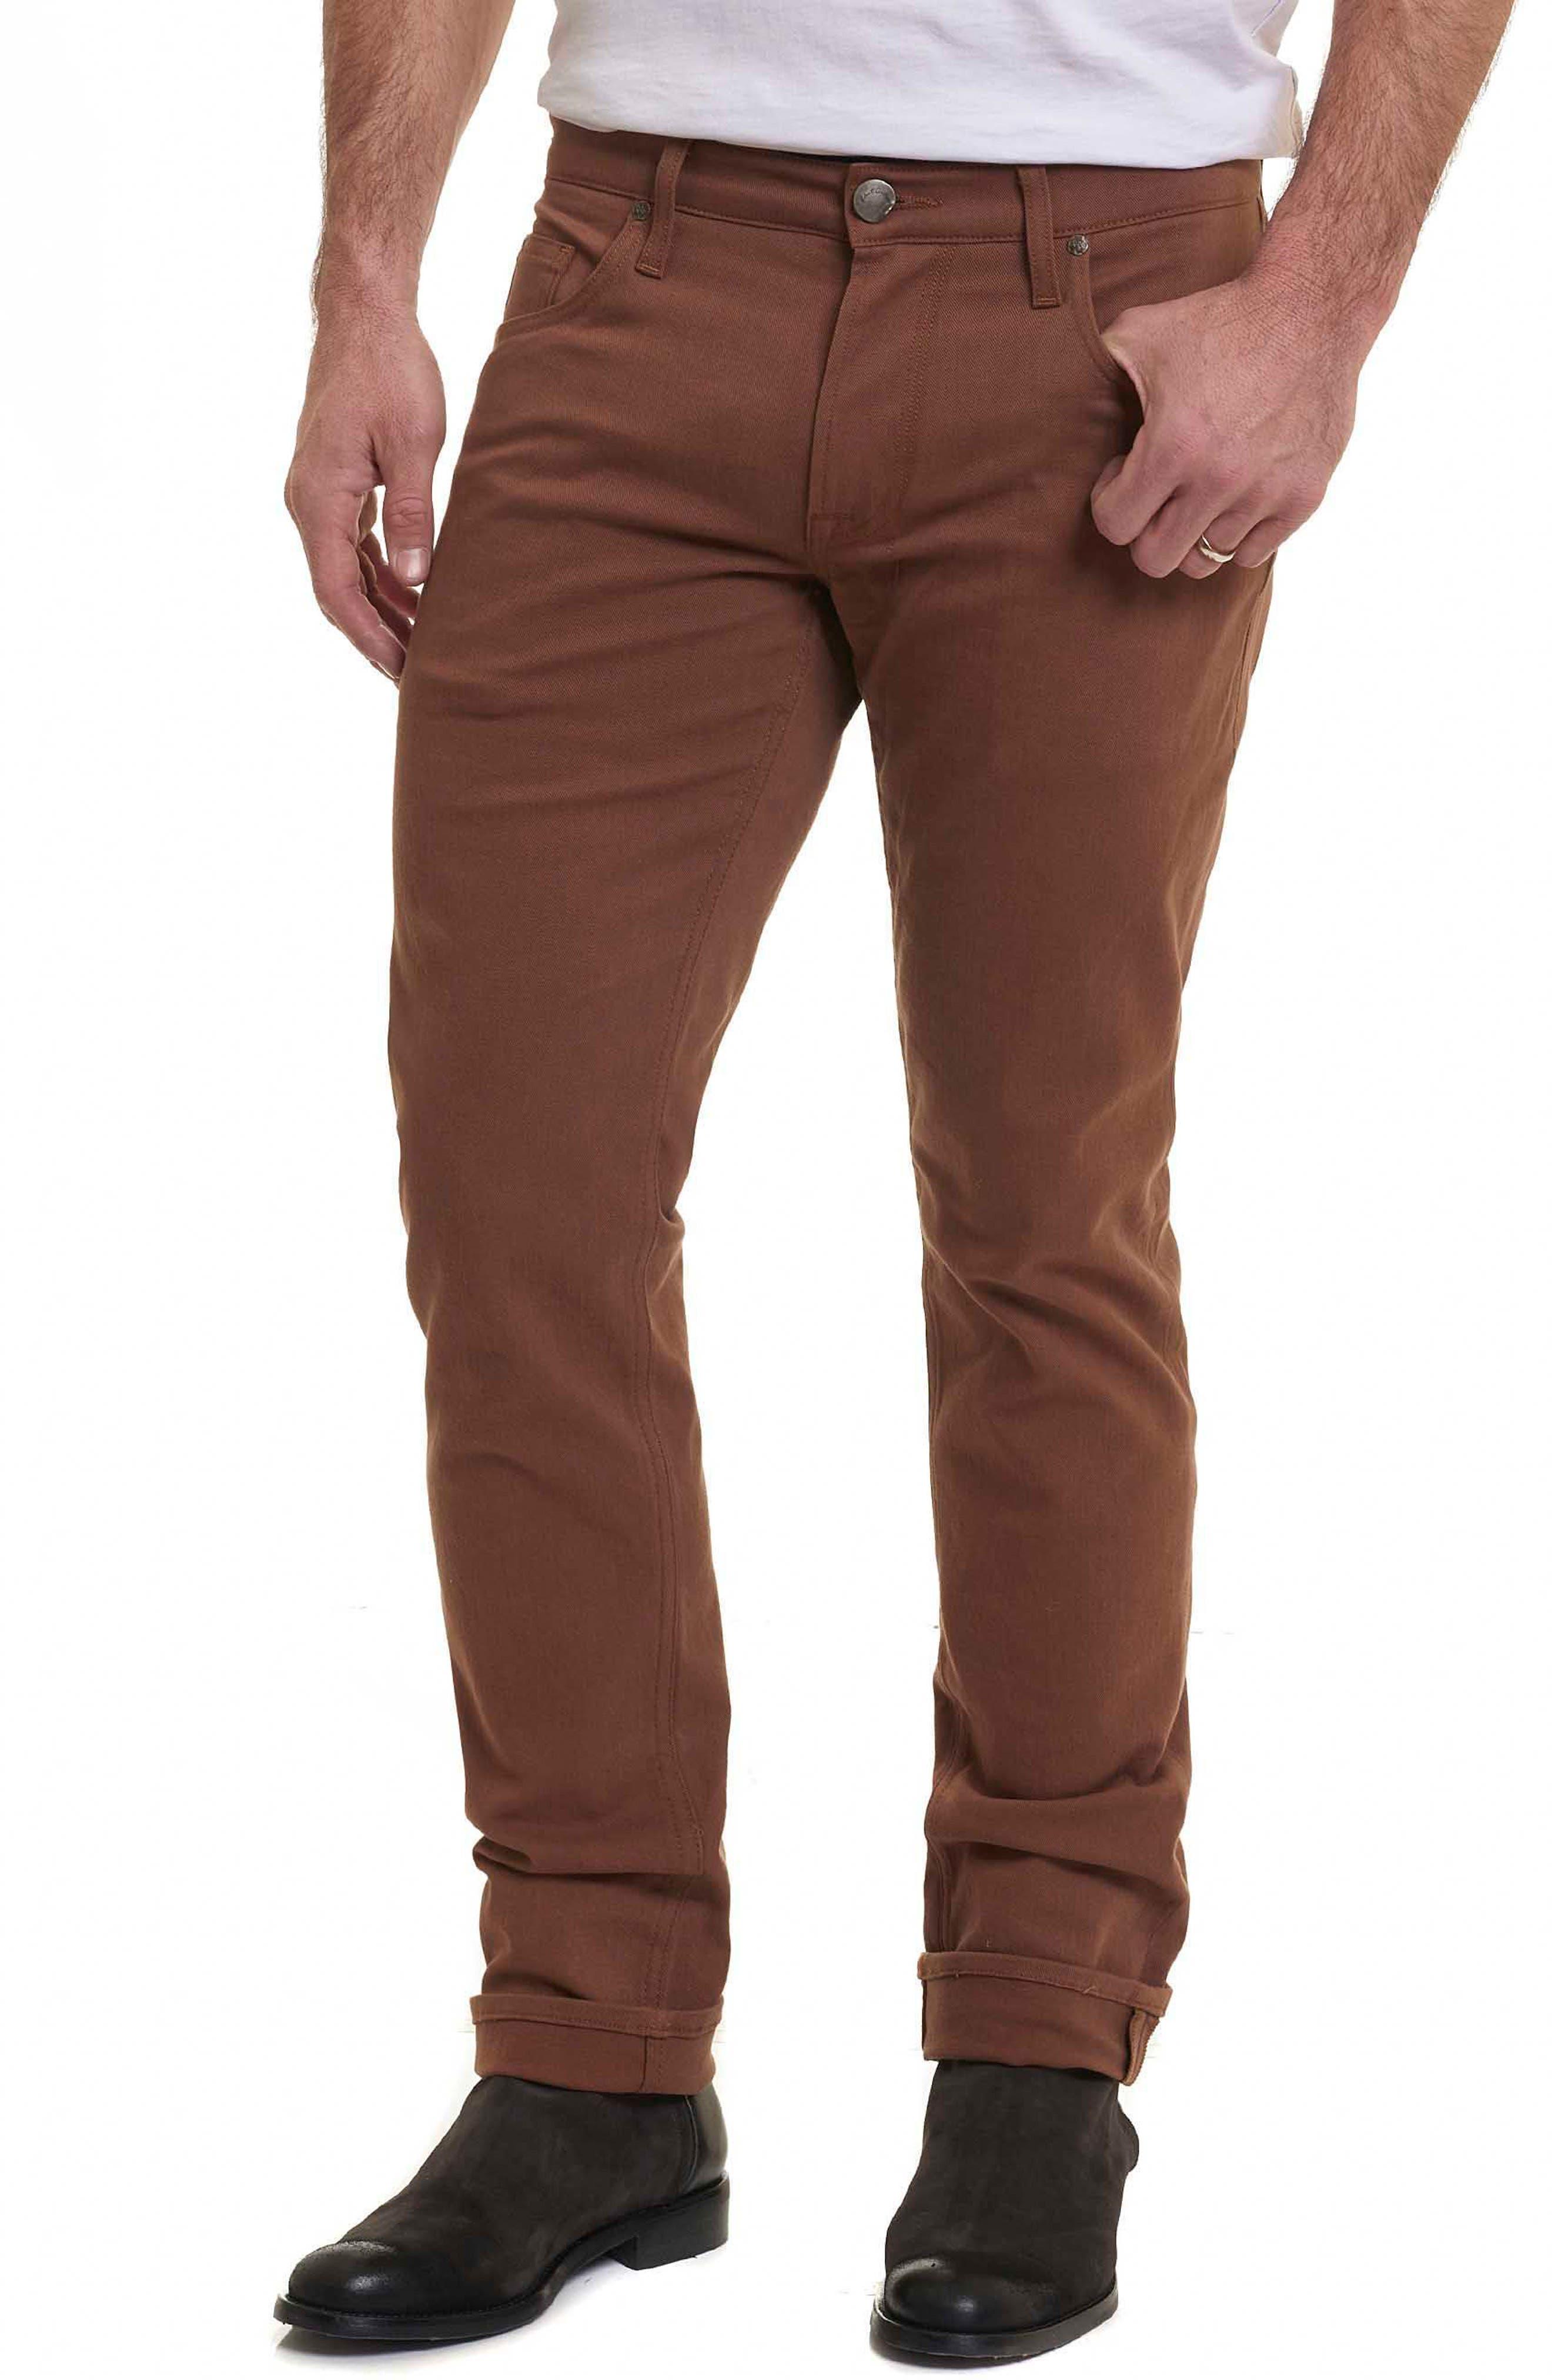 Corwin Classic Fit Jeans,                             Main thumbnail 1, color,